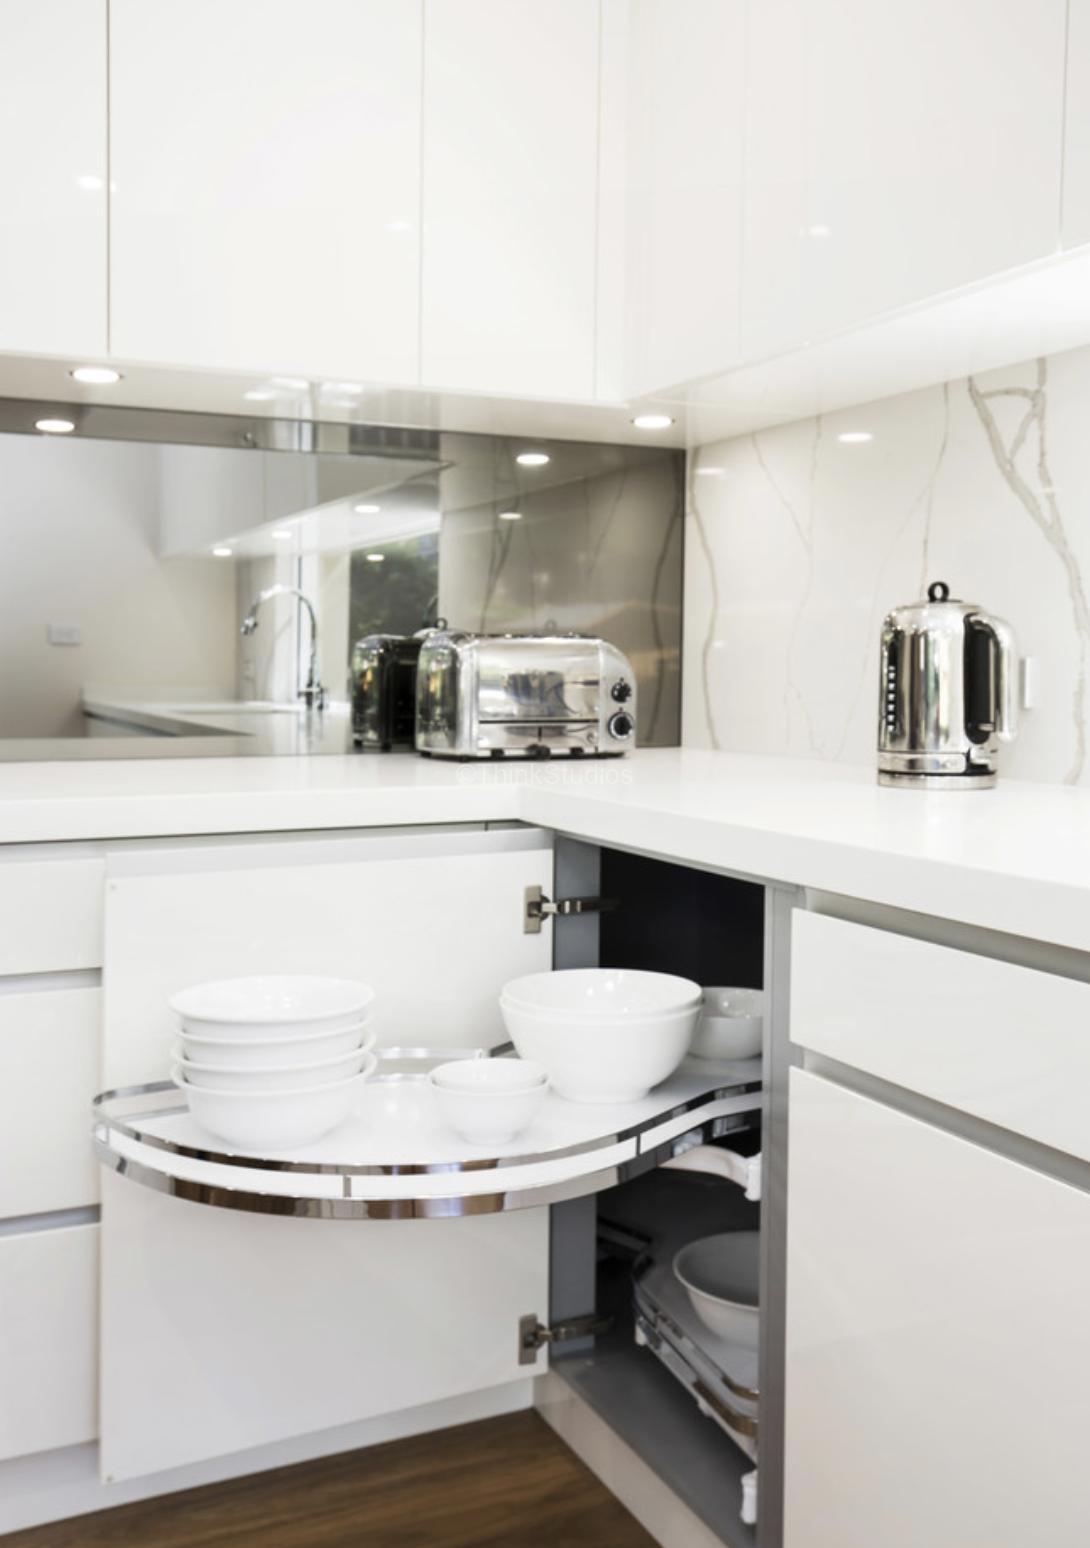 Dan-Kitchen Cabinet